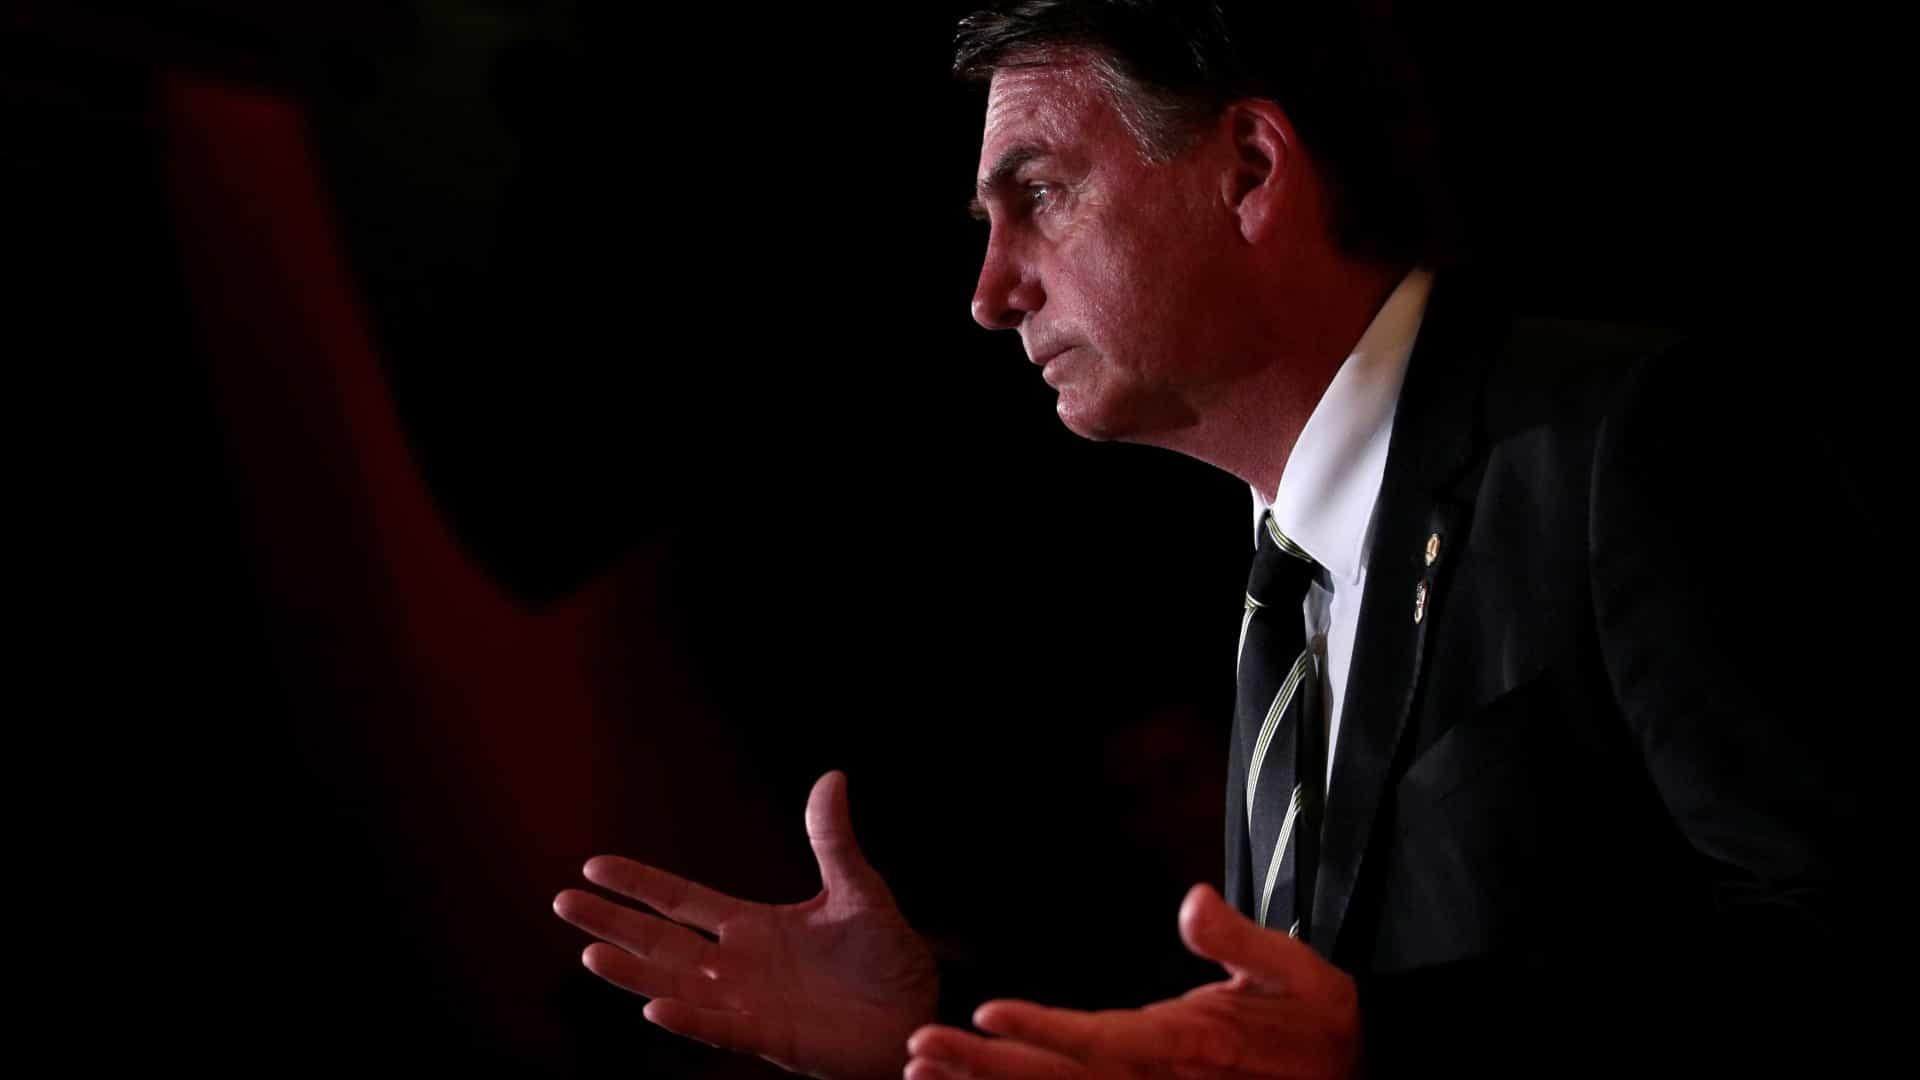 Bolsonaro acaba de chegar ao PSL e jA? encara ambiente hostil